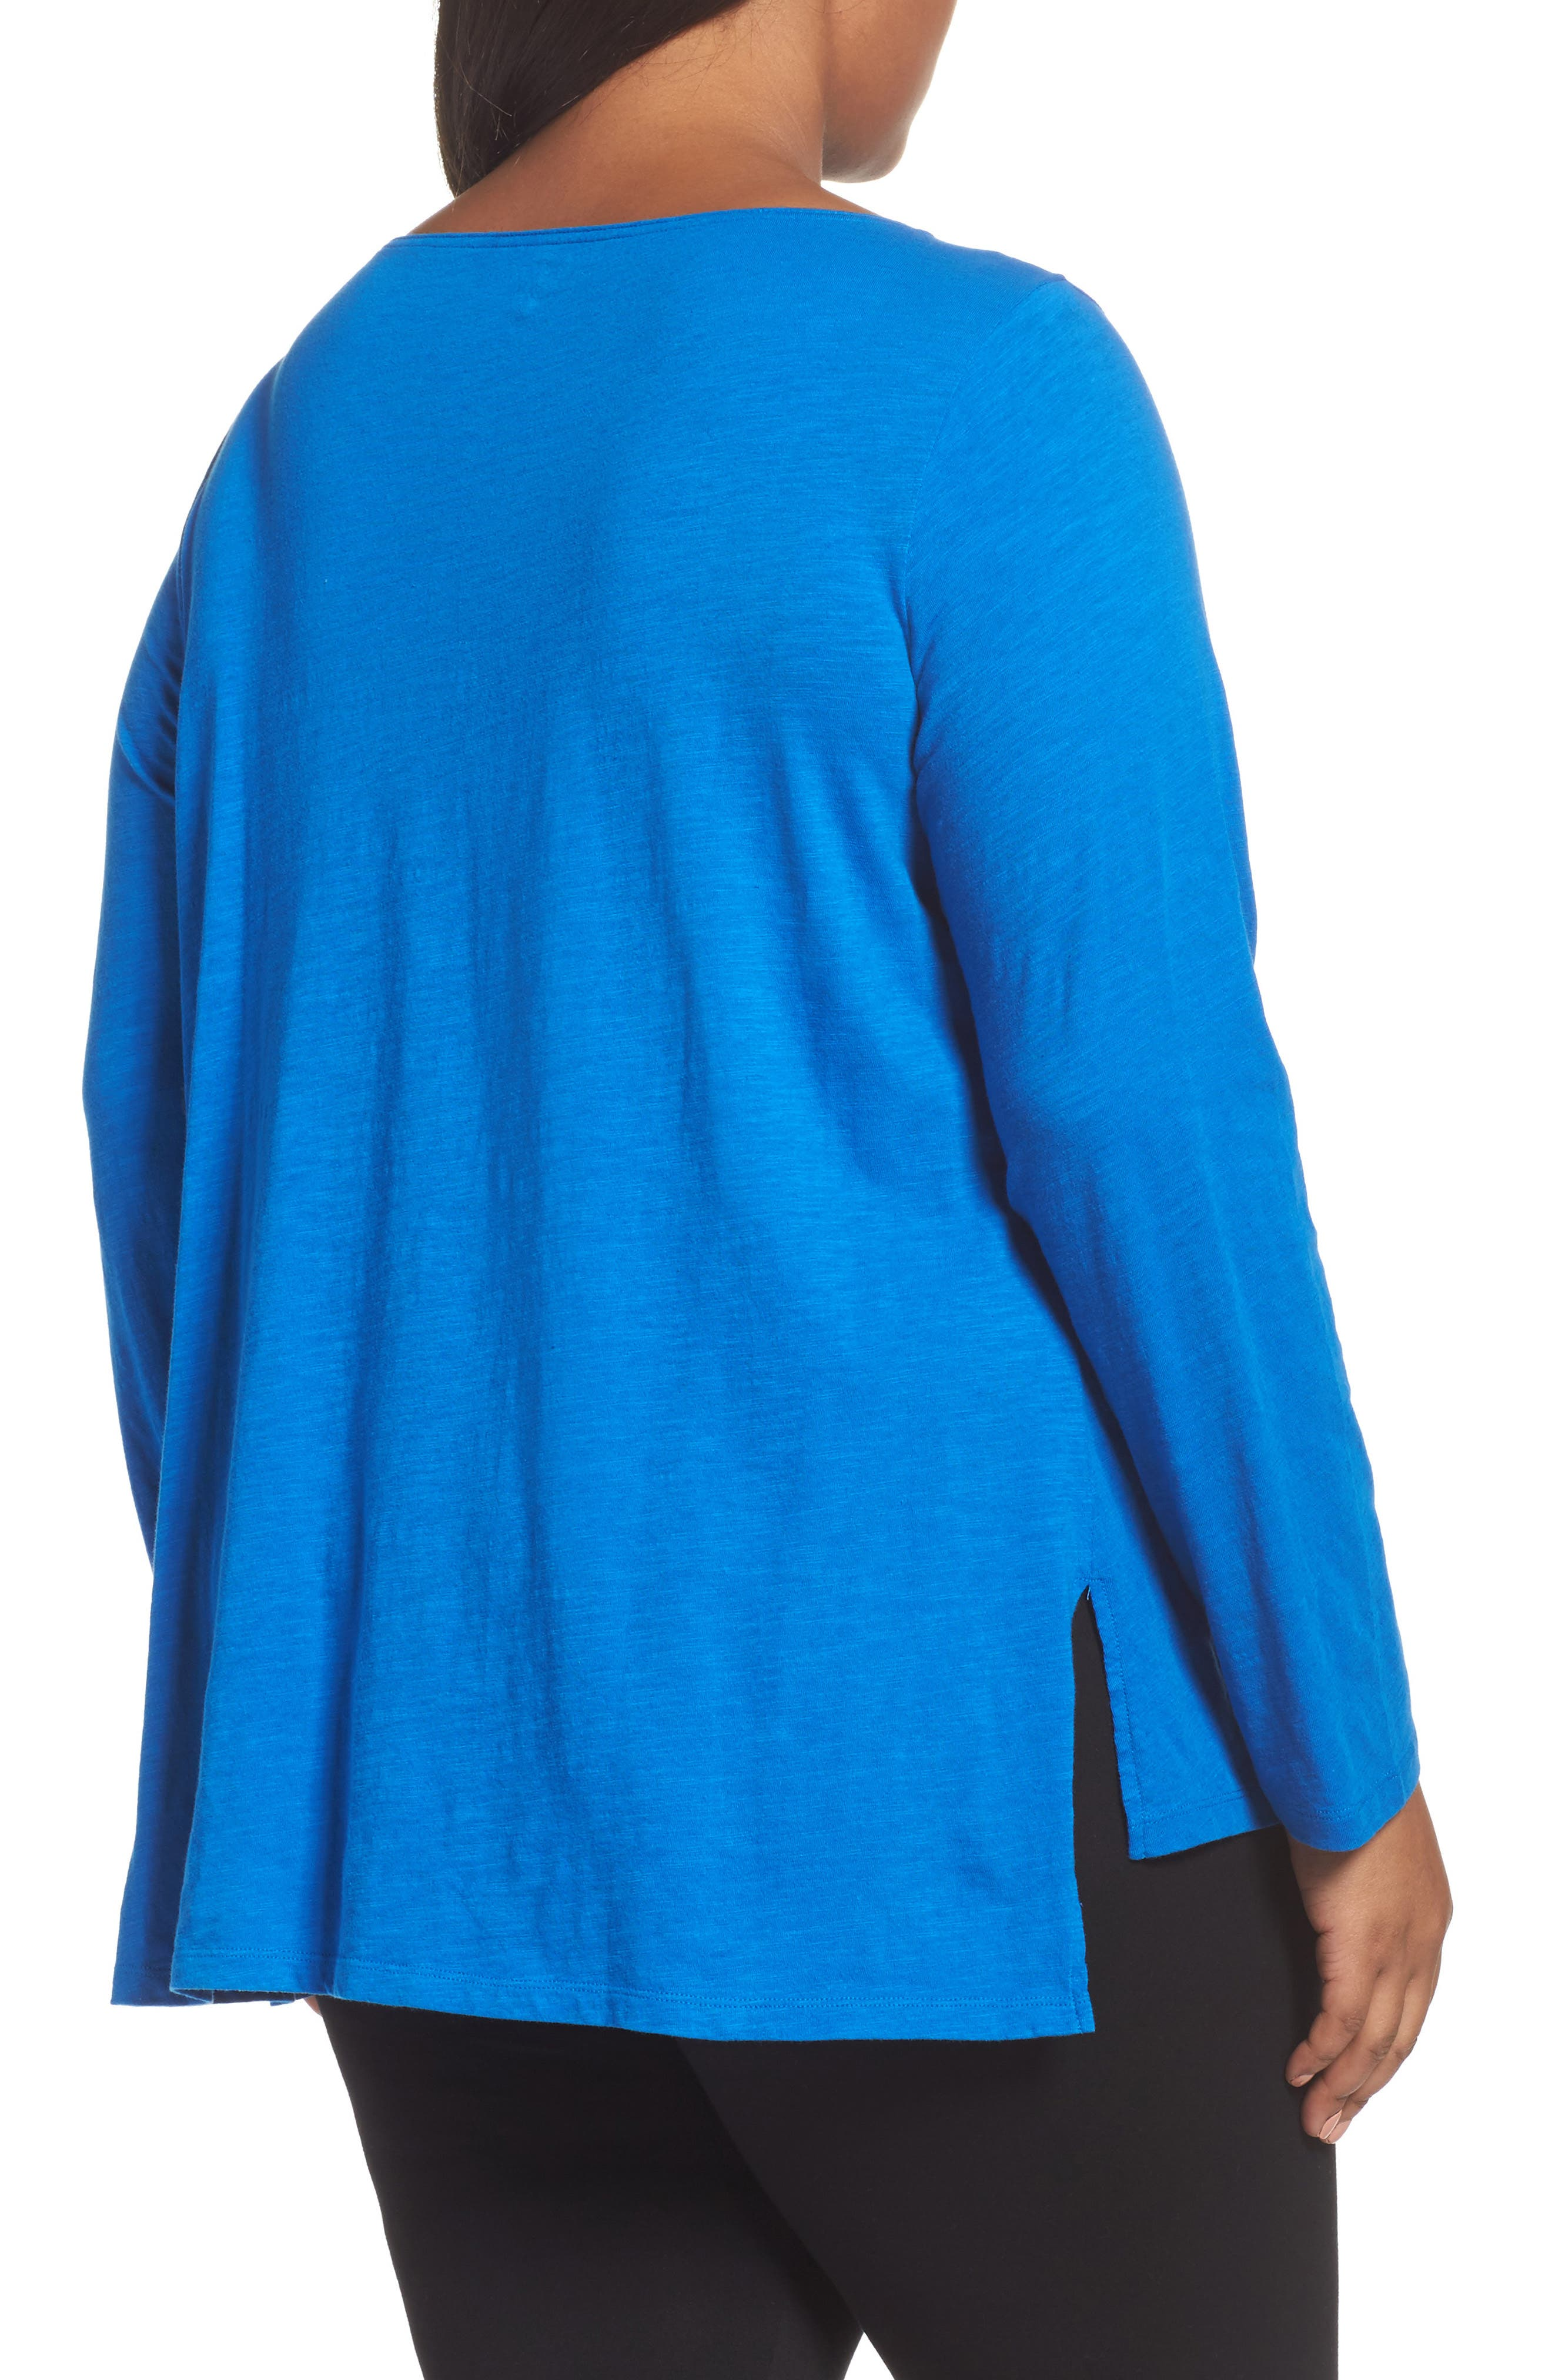 Organic Cotton Jersey Top,                             Alternate thumbnail 2, color,                             Blue